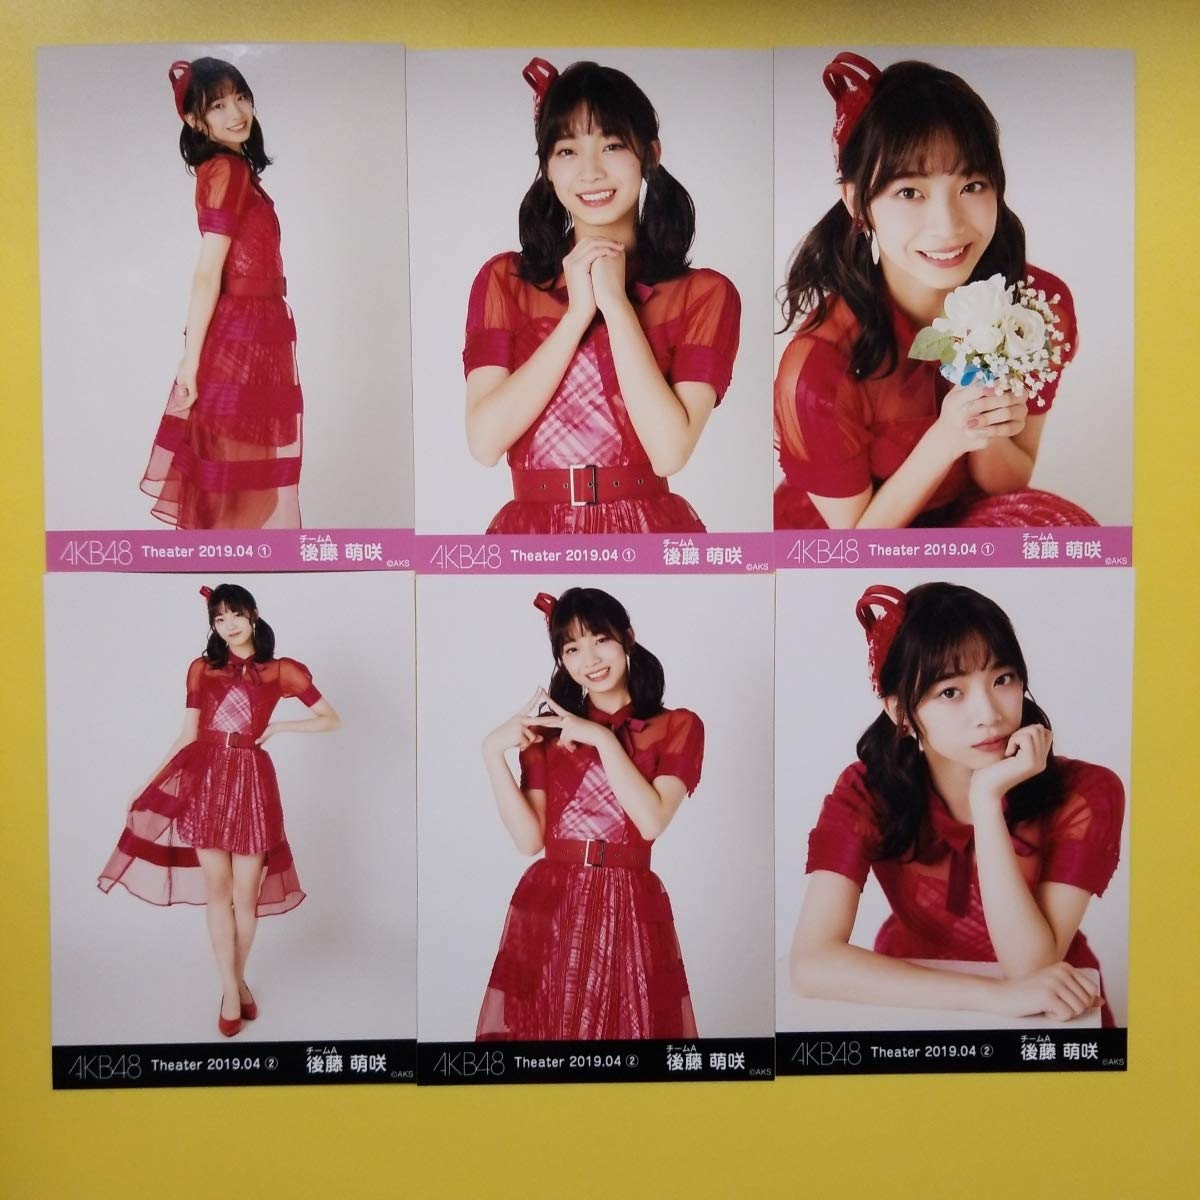 AKB48 後藤萌咲 月別生写真 2019 4月 April ①+② 6種コンプ   B07QDKGP8X